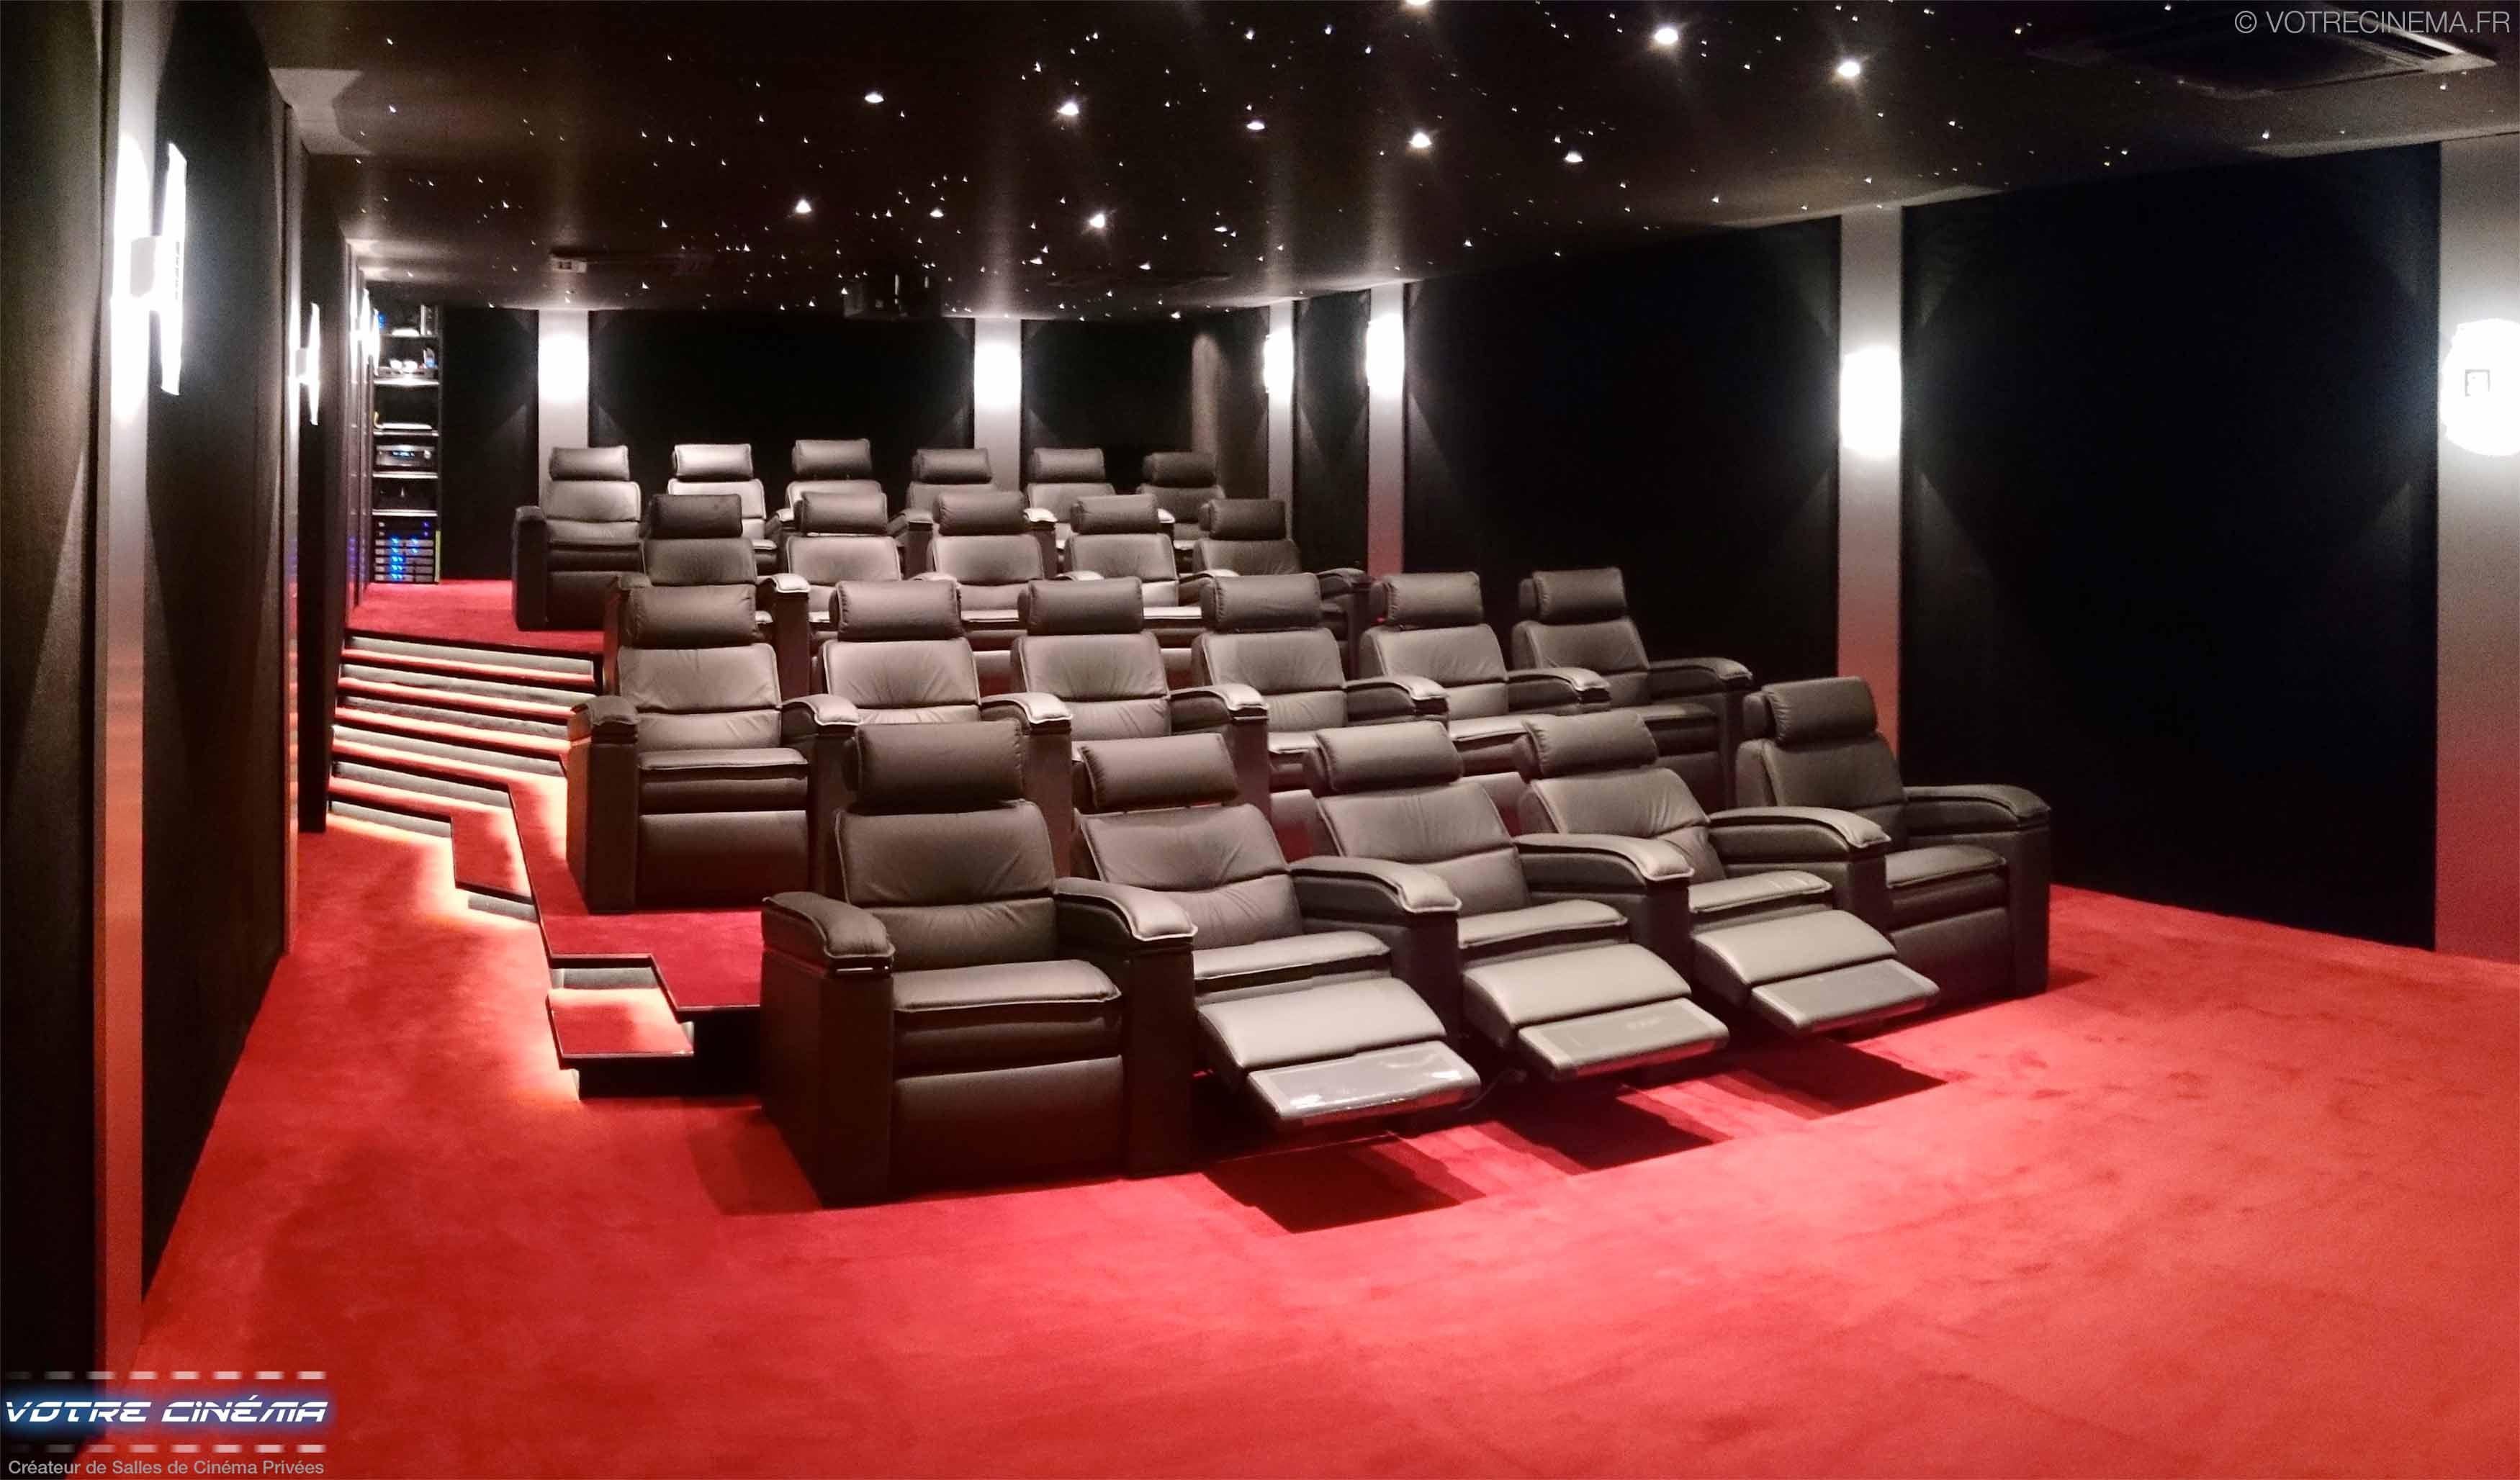 réalisation salle cinéma privée Burkina Faso